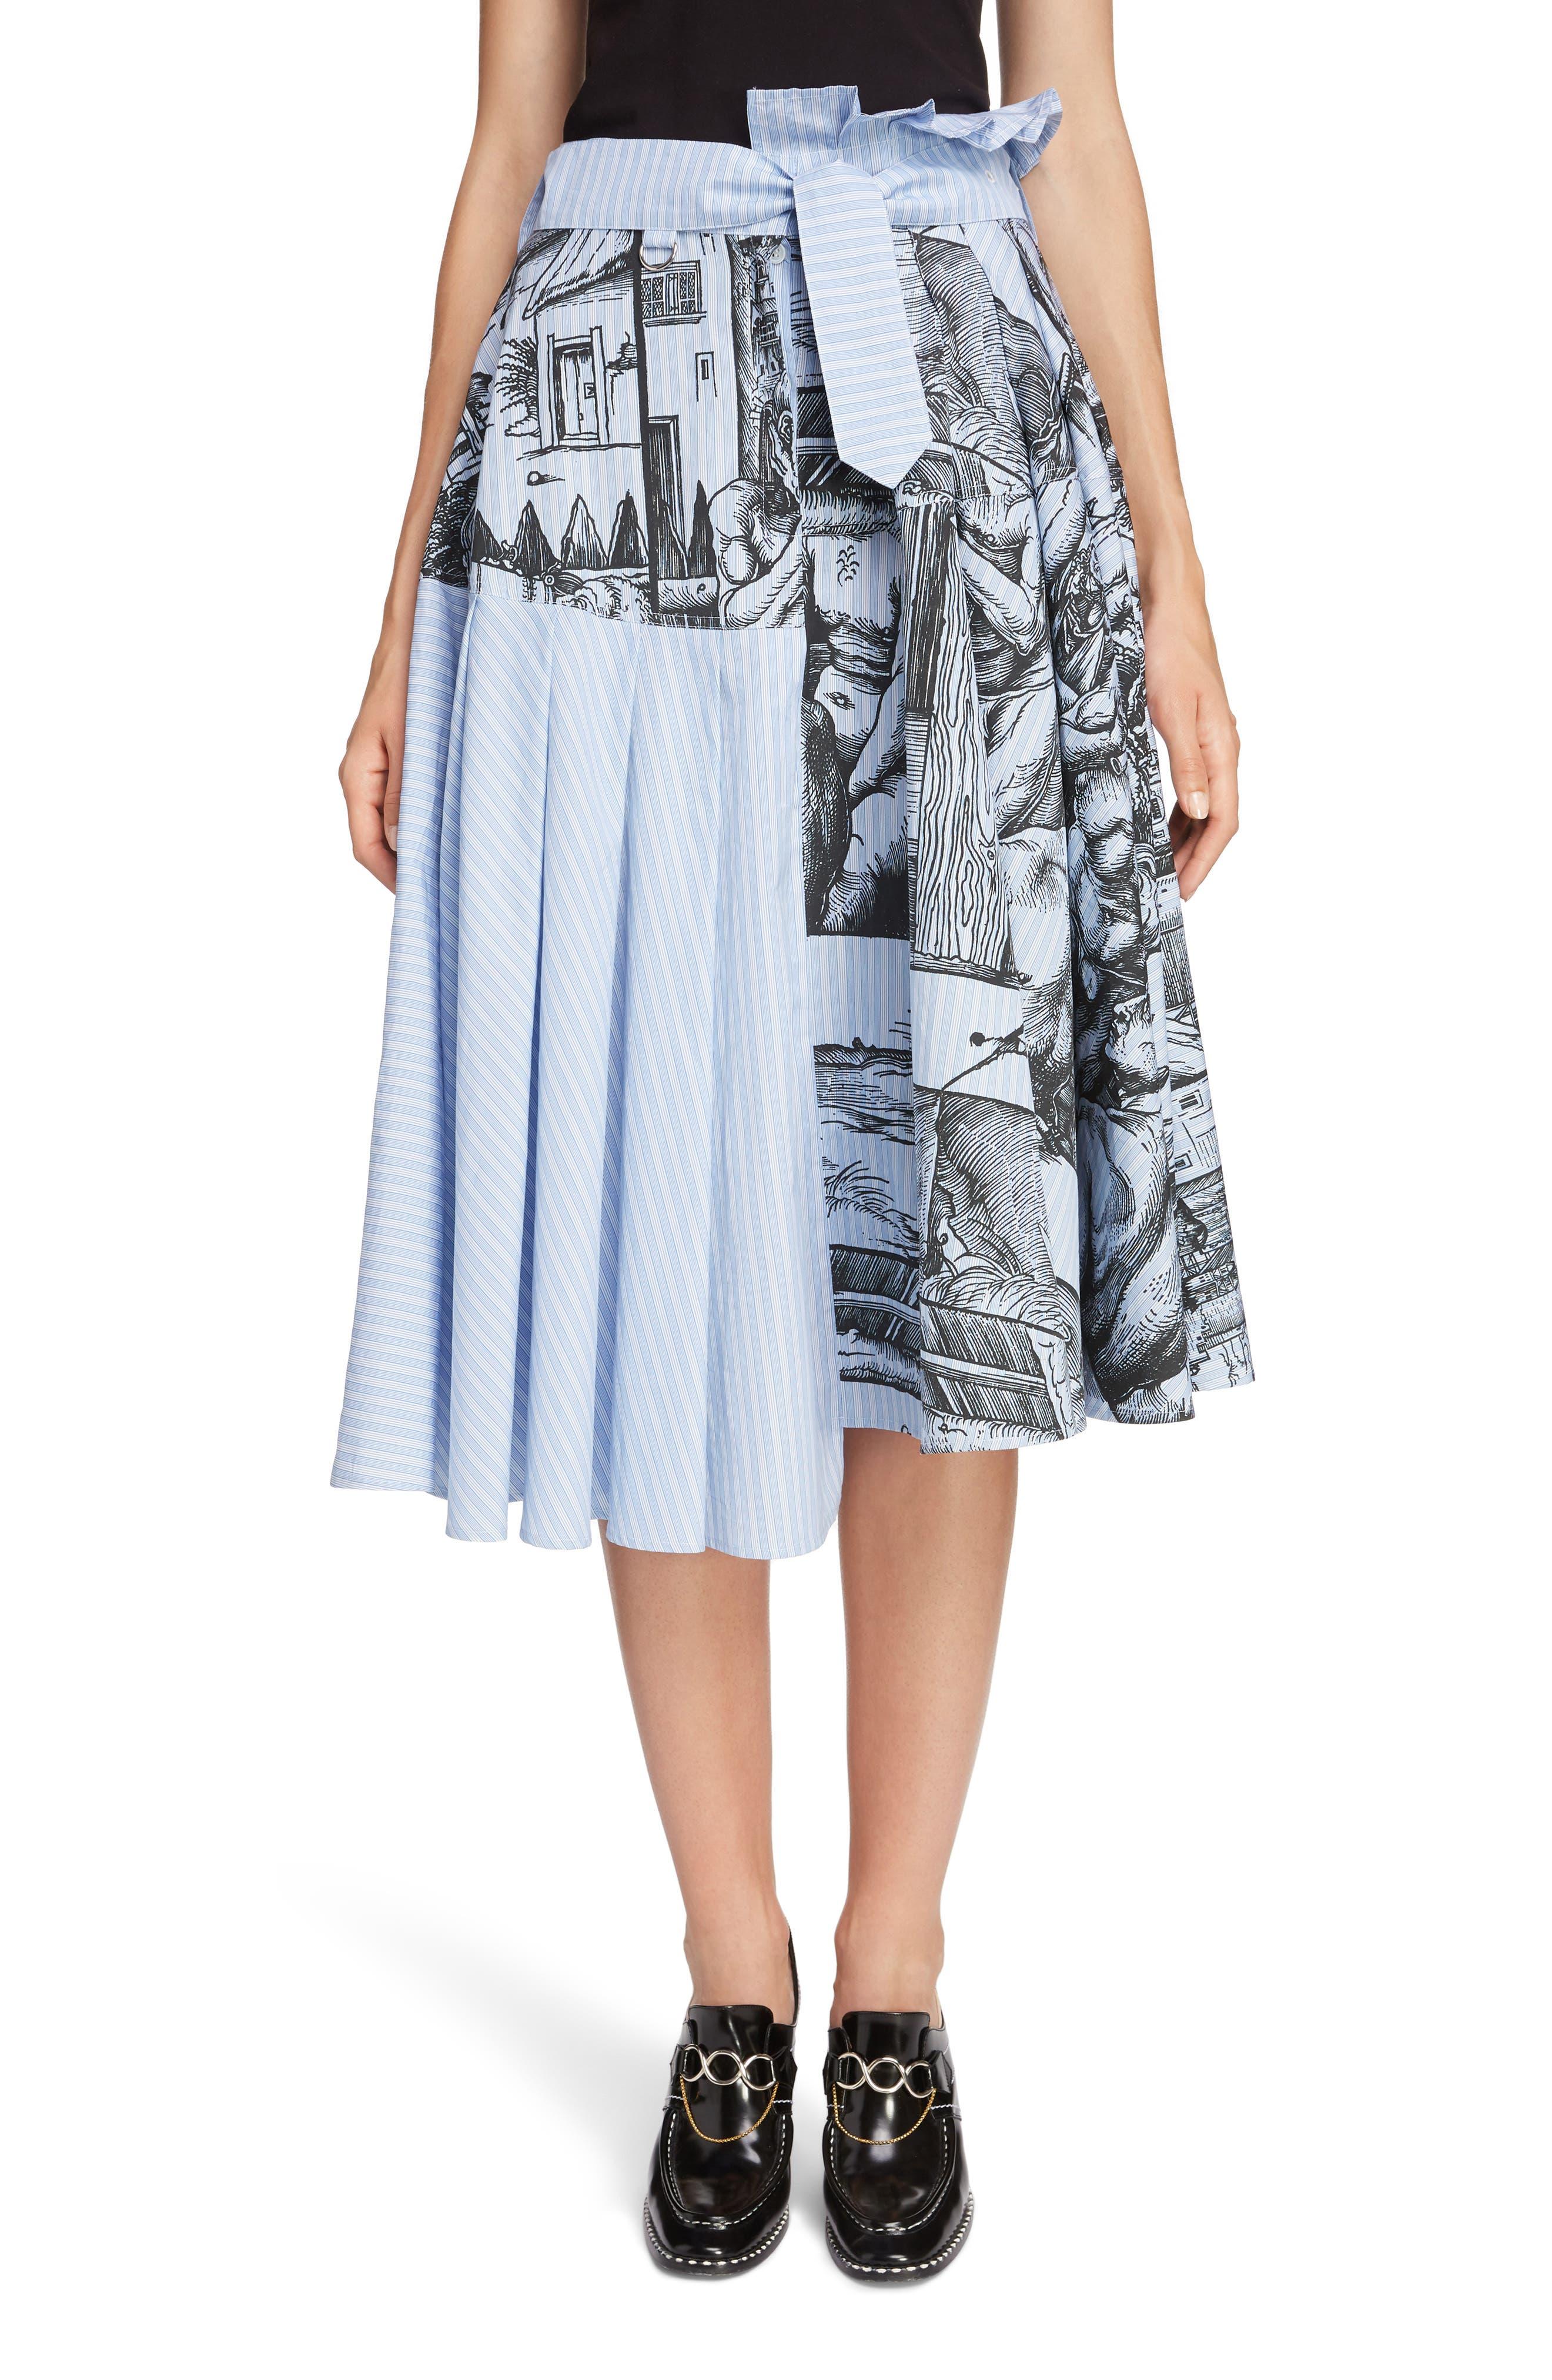 JW ANDERSON Dürer Scene Print Stripe Skirt, Main, color, CHINA BLUE